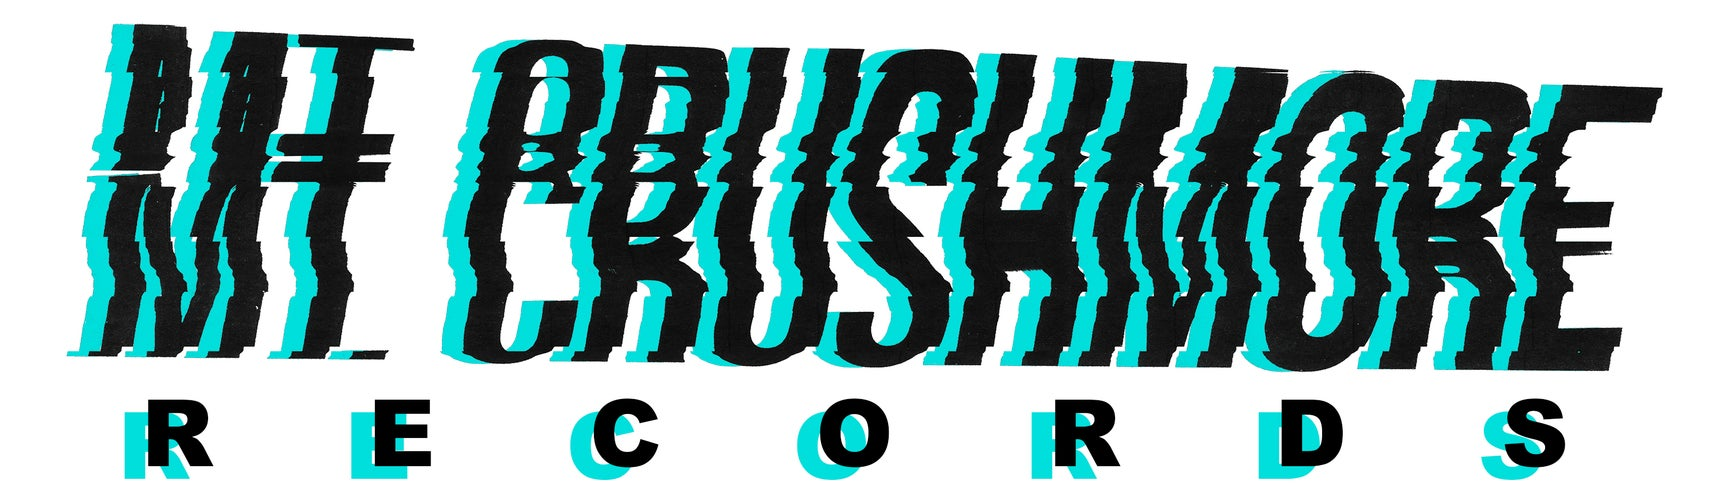 Mt. Cushmore Records